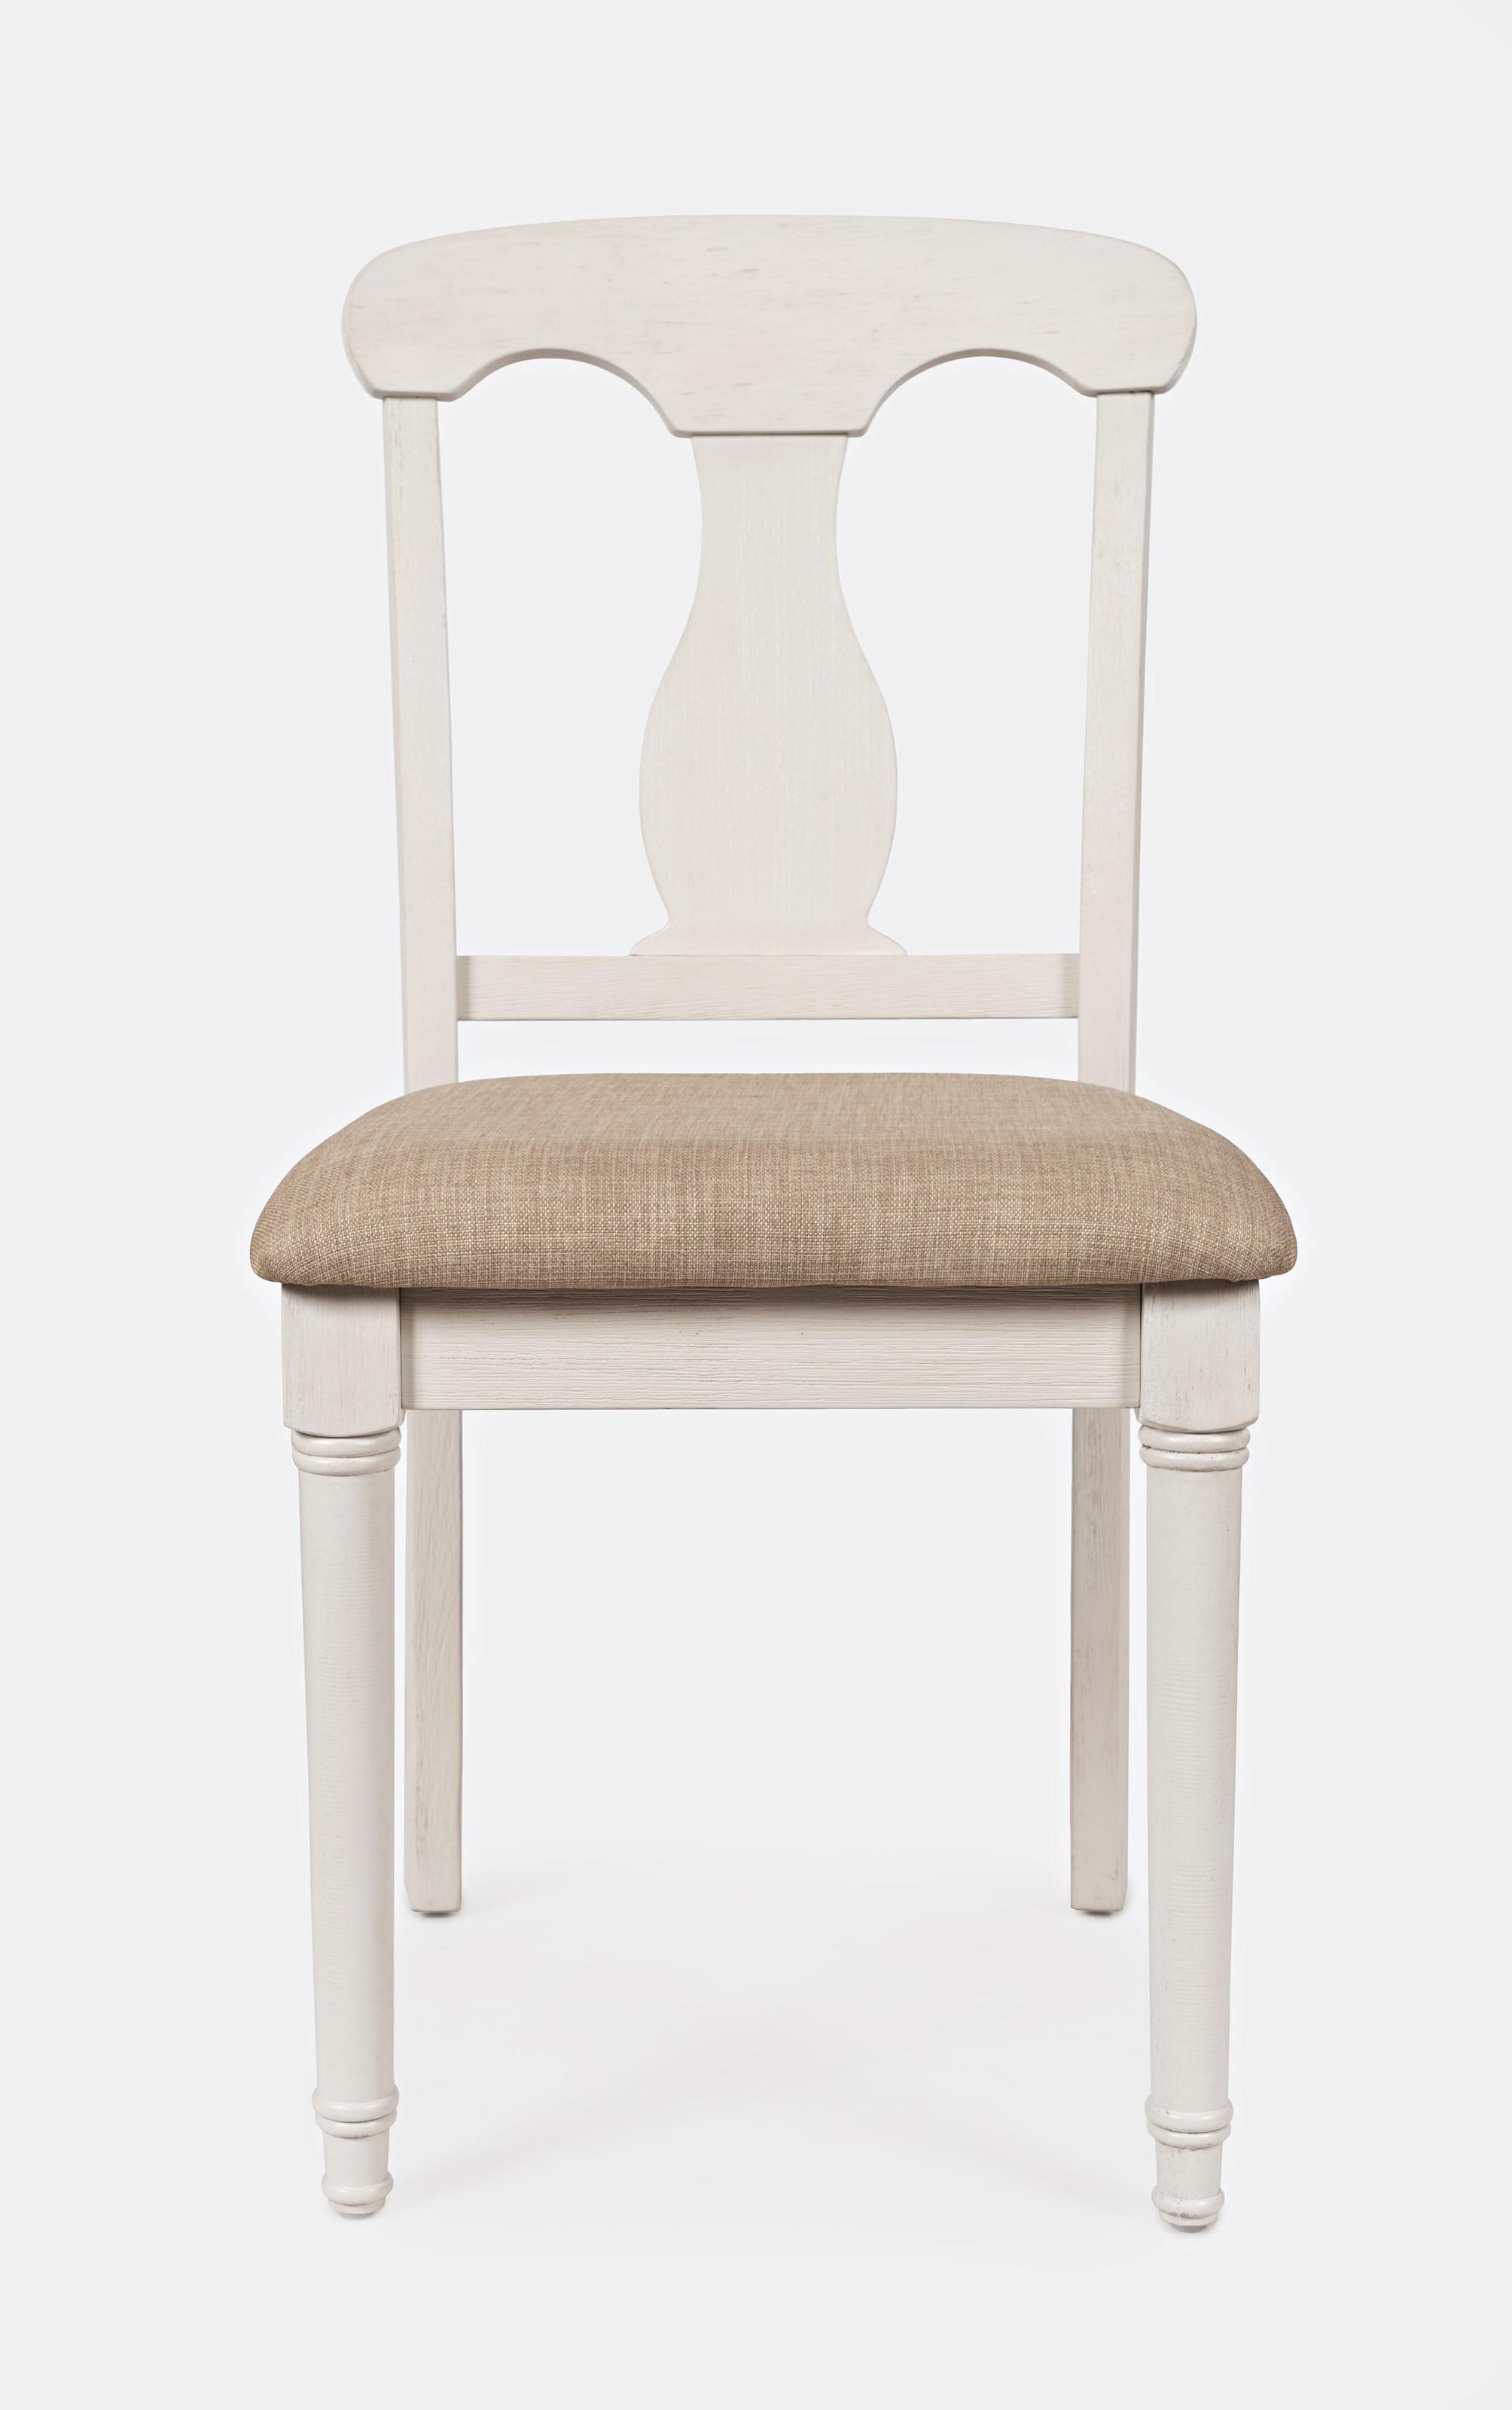 Grafton Farms Desk Chair by Jofran at Jofran